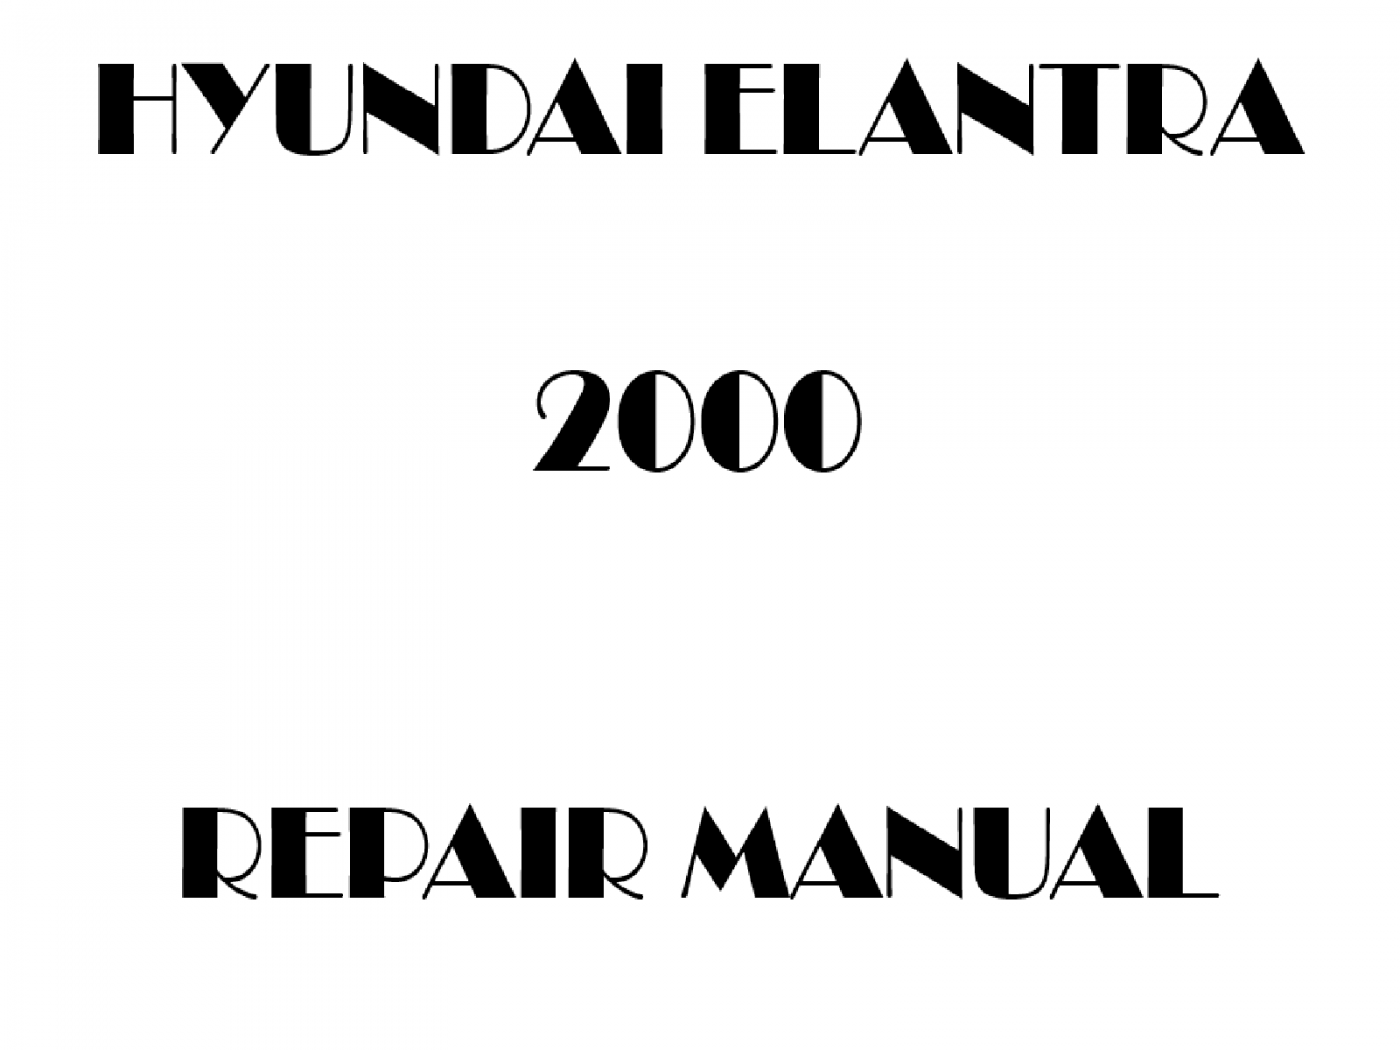 2000 Hyundai Elantra repair manual